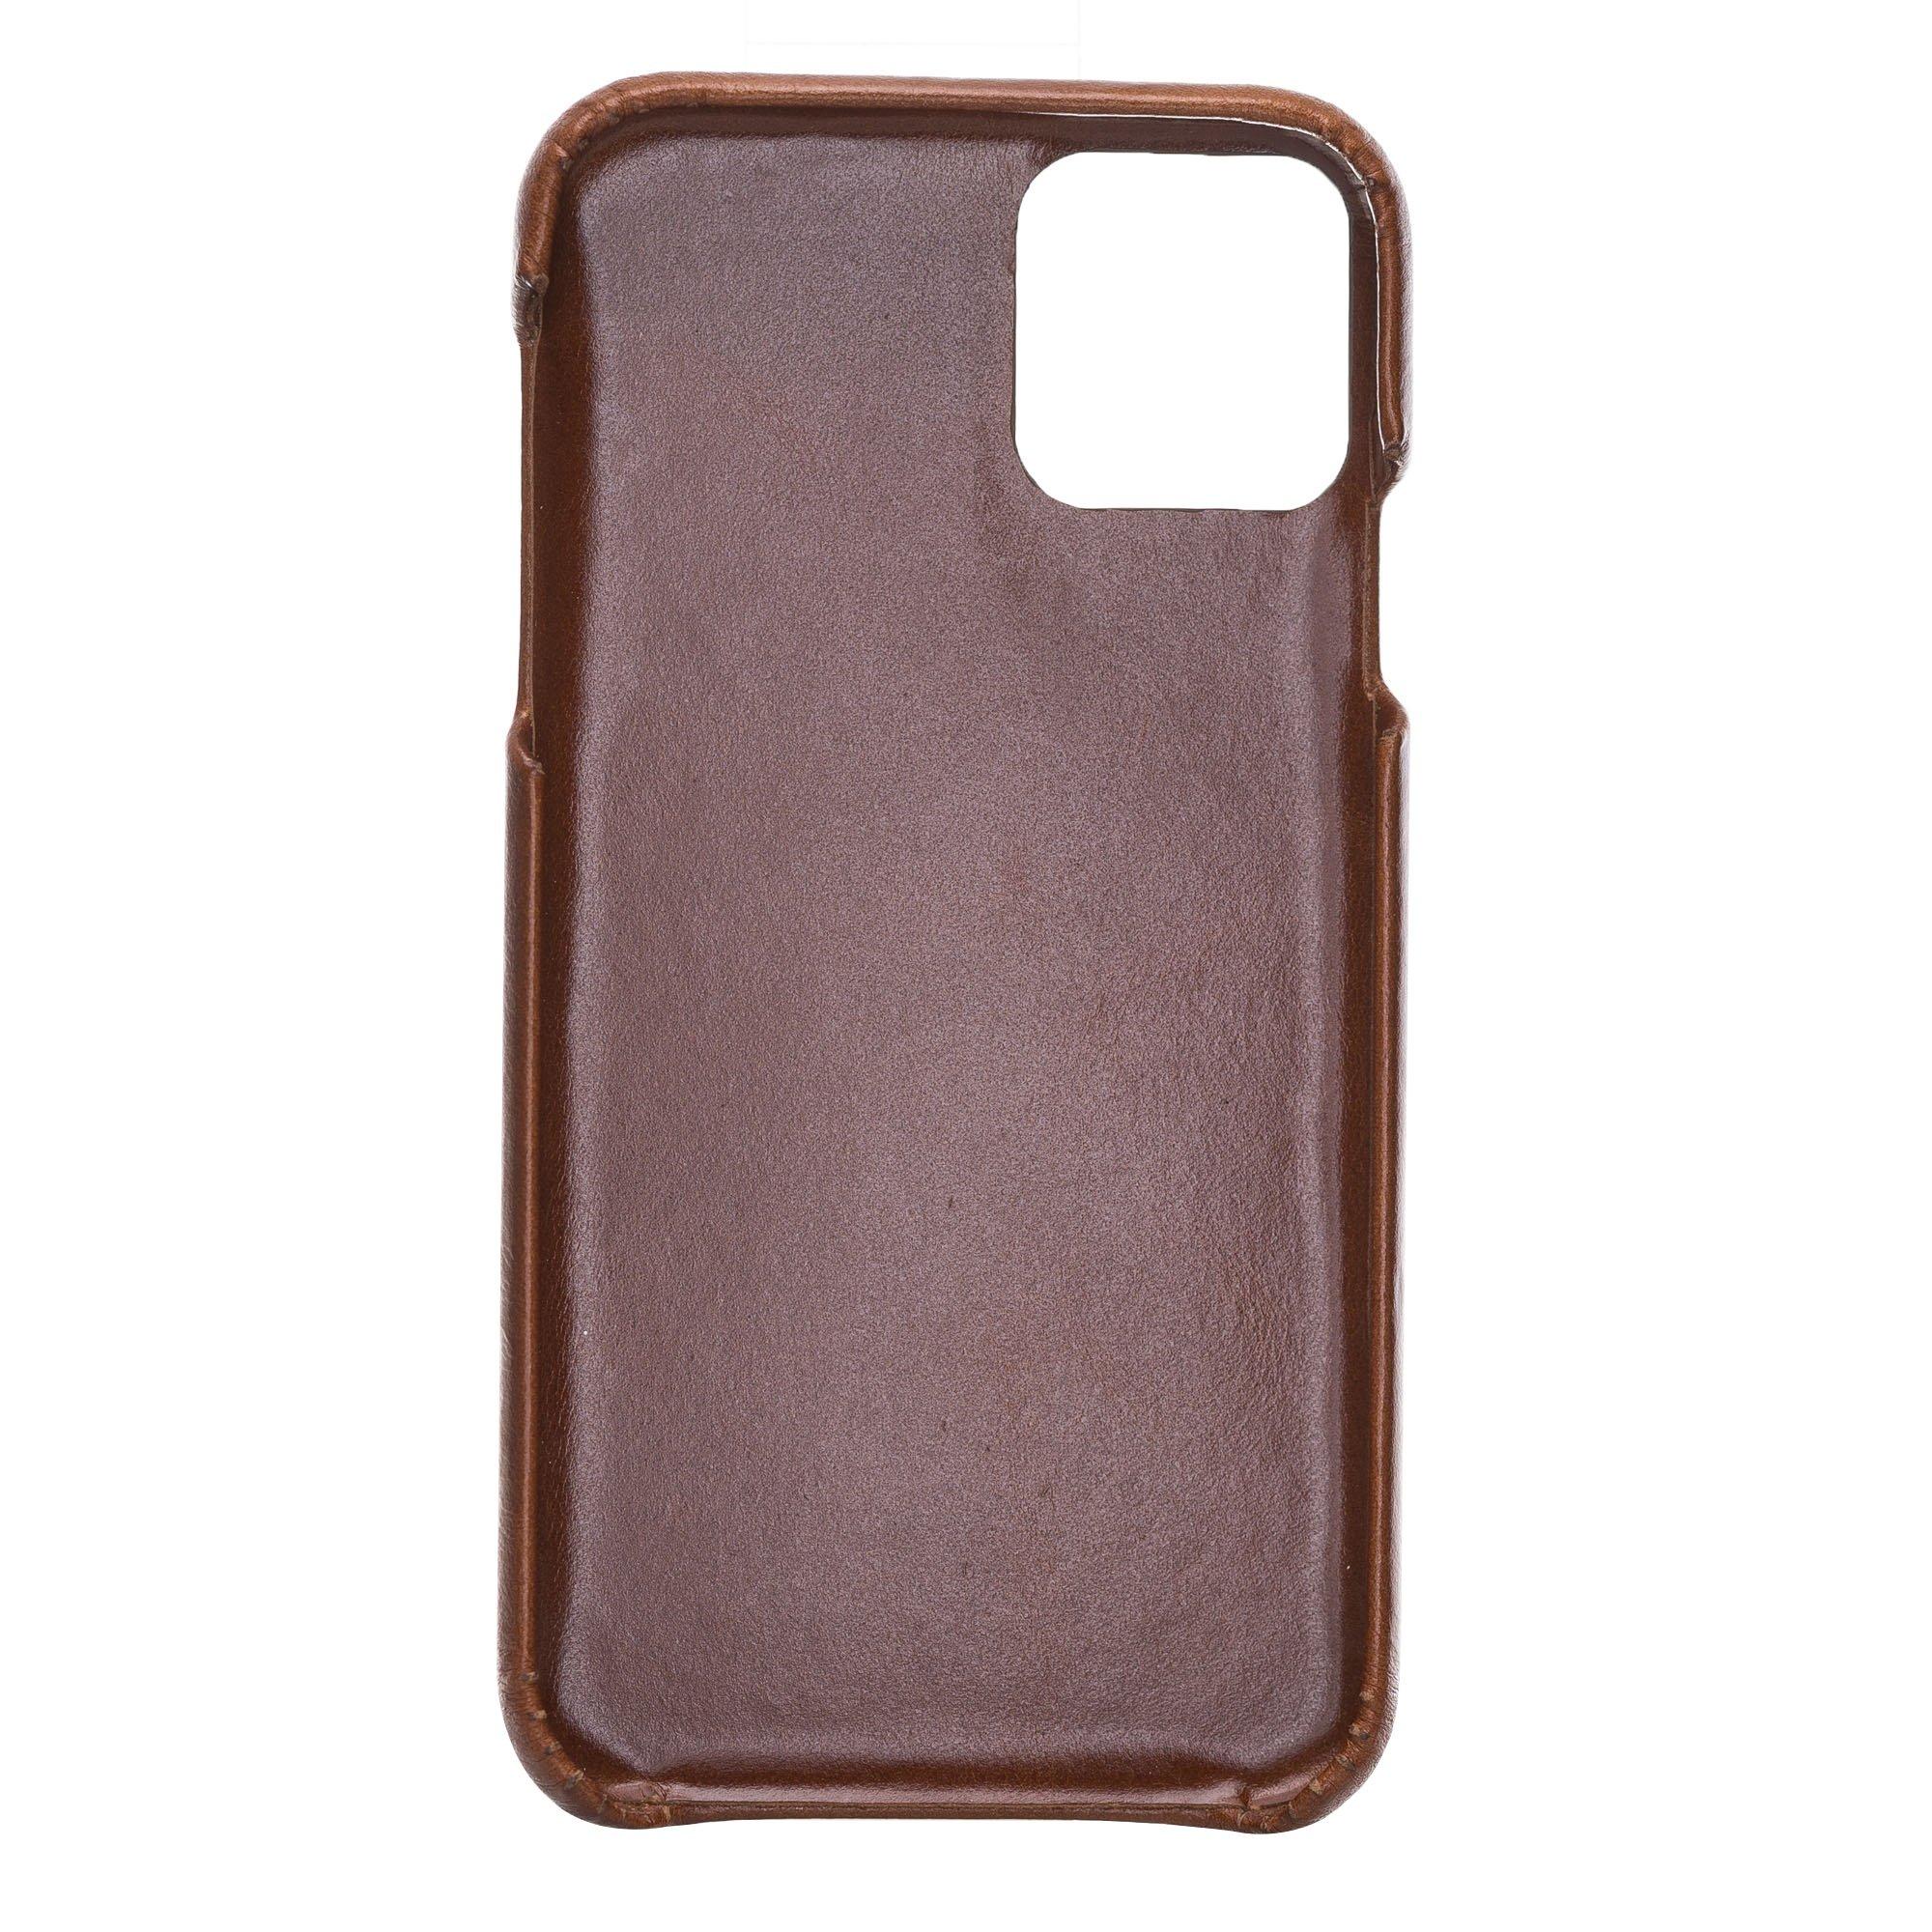 Lederhülle kompatibel für iPhone 11 in 6.1 Zoll abnehmbare Hülle (2in1) inkl. Kartenfächer (Vollleder Camelbraun)